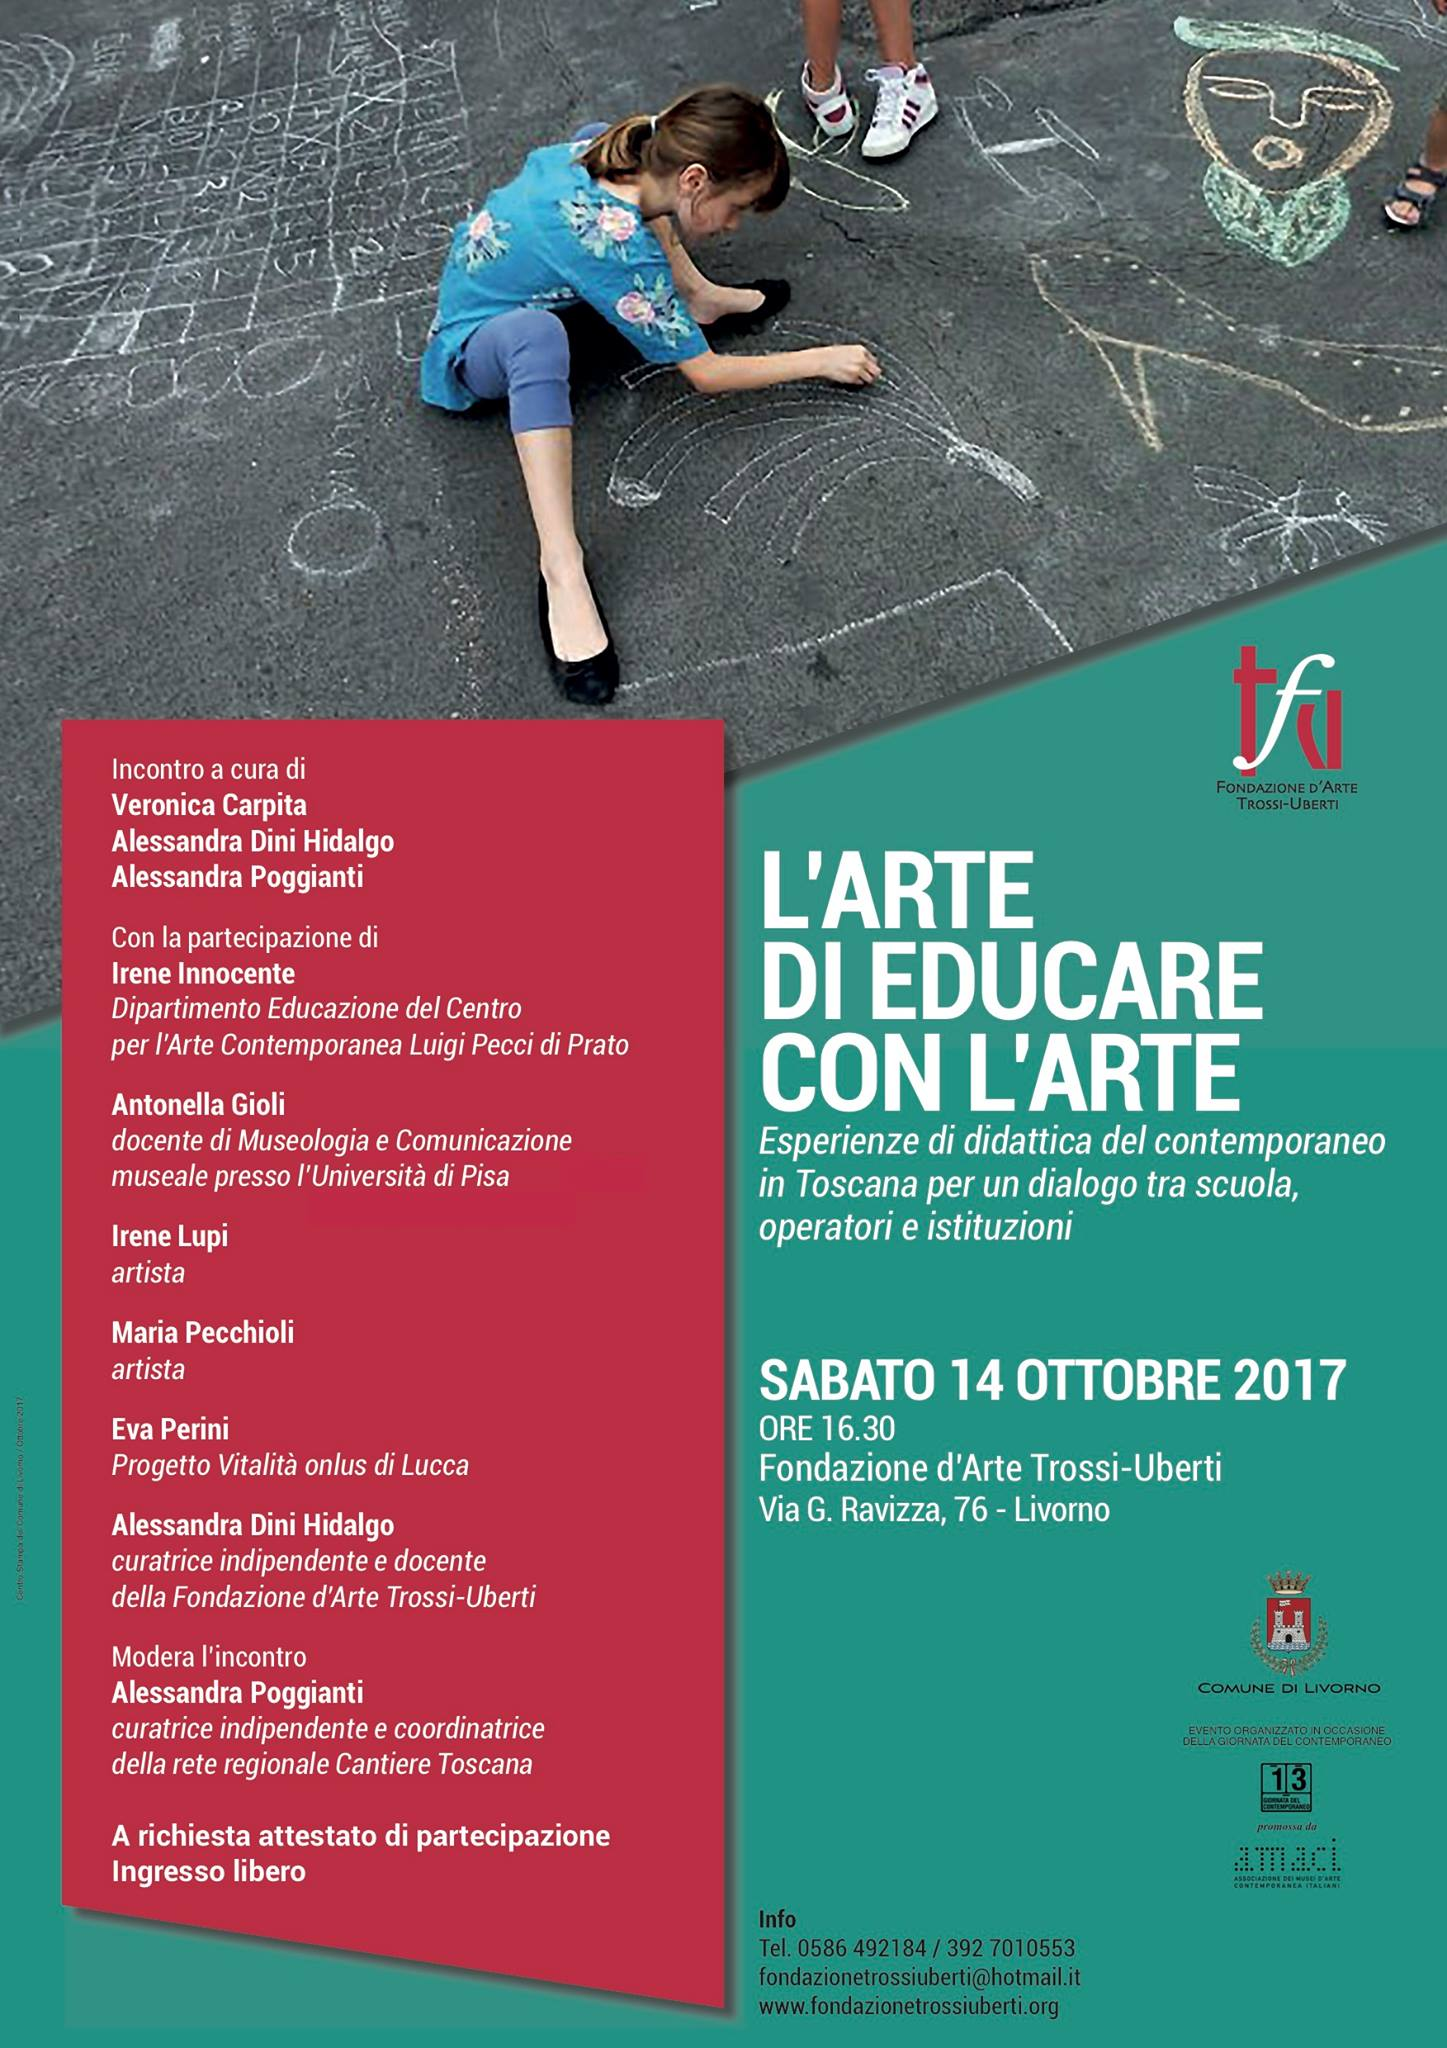 incontro_Artedi EducareconArte_livorno